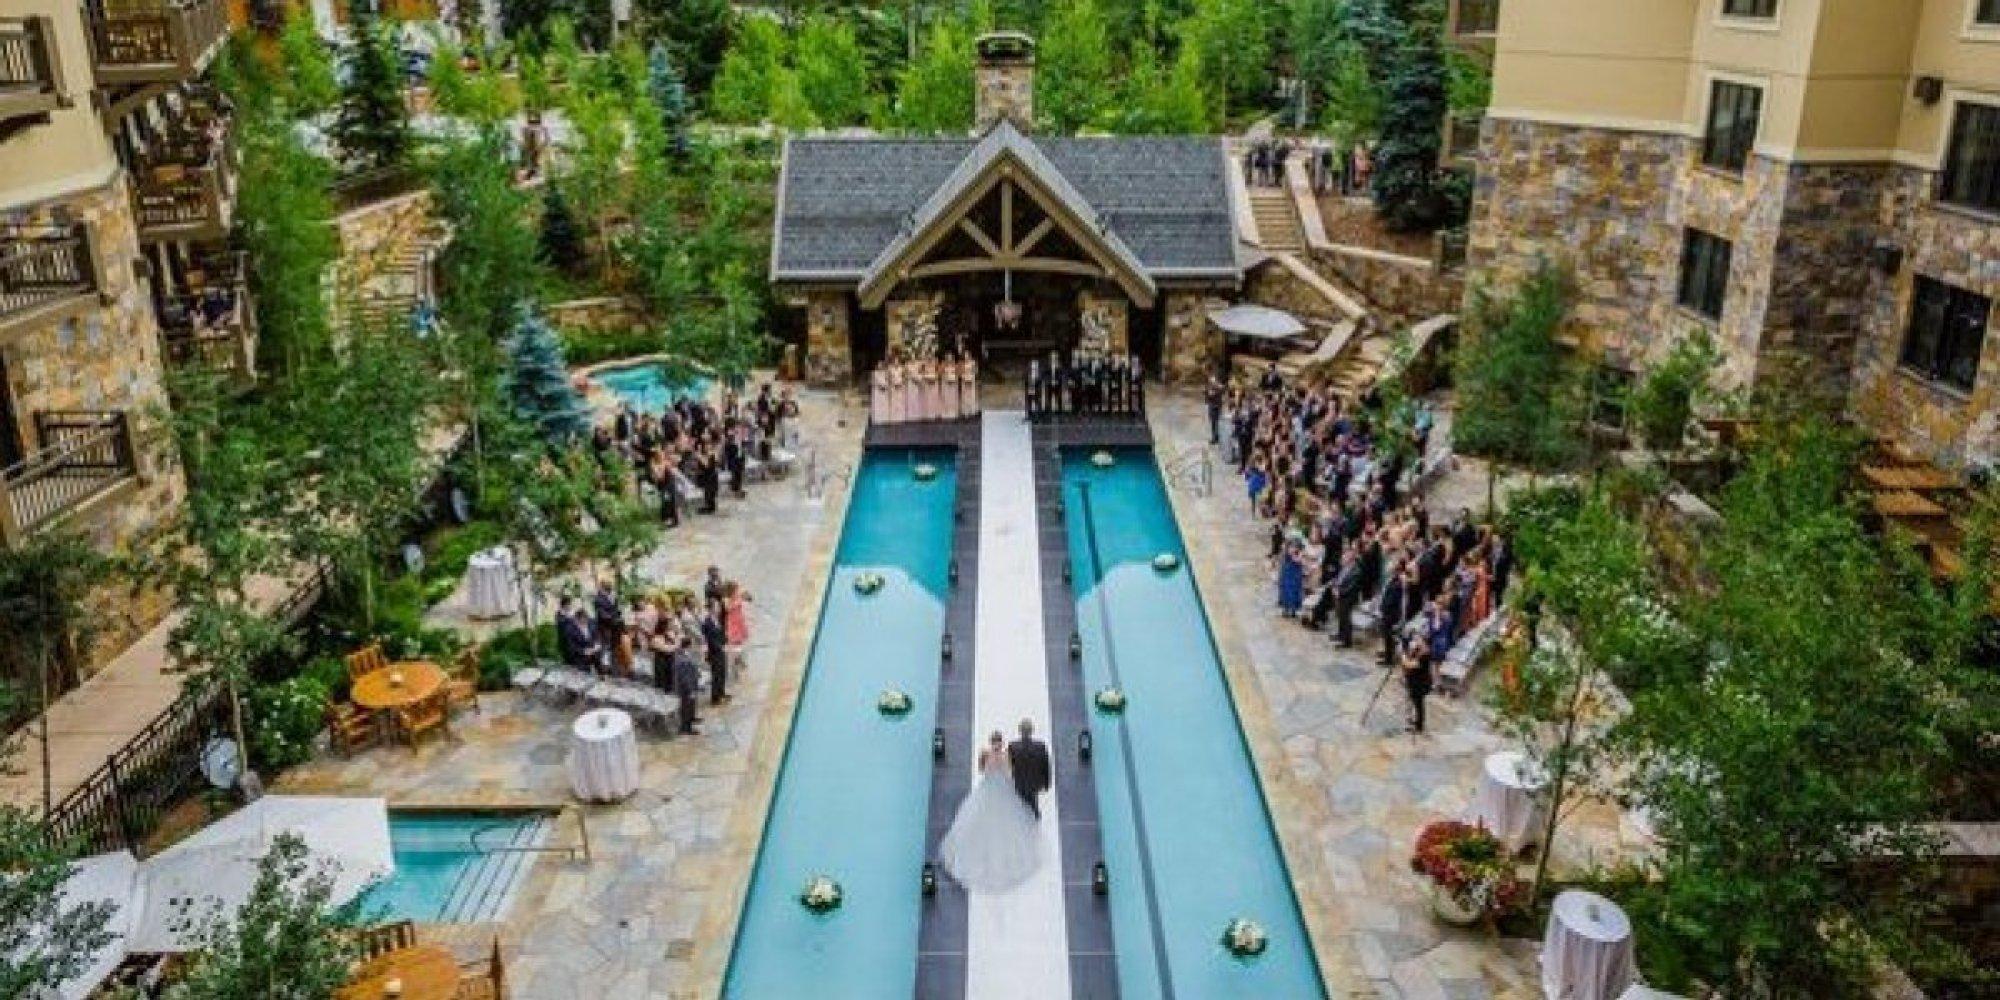 50 Wedding Ideas You Haven't Already Seen All Over